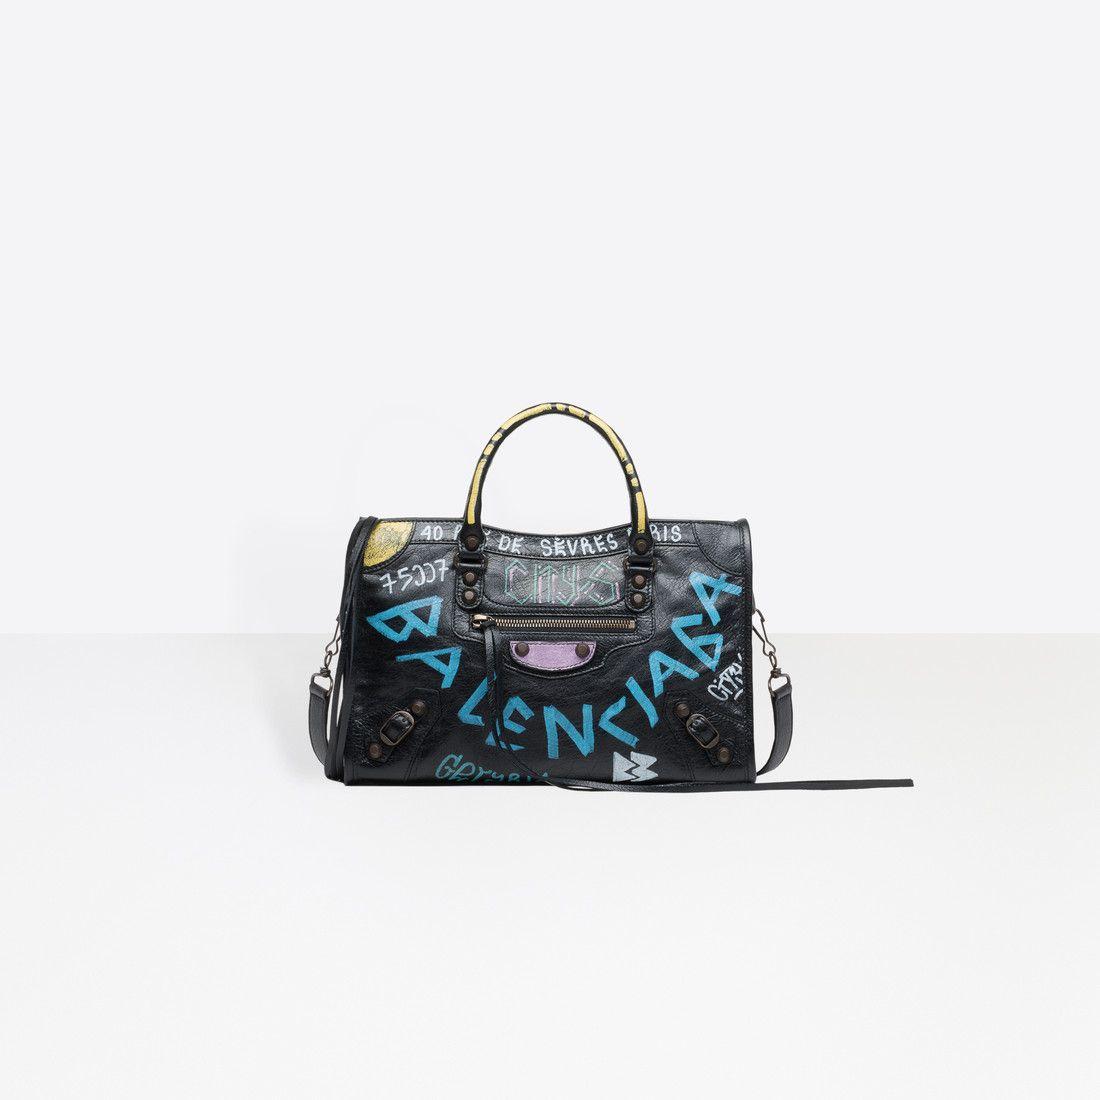 Classic City Small Shoulder Bag Black For Women Balenciaga Black Leather Handbags Small Shoulder Bag Lambskin Chanel Bag